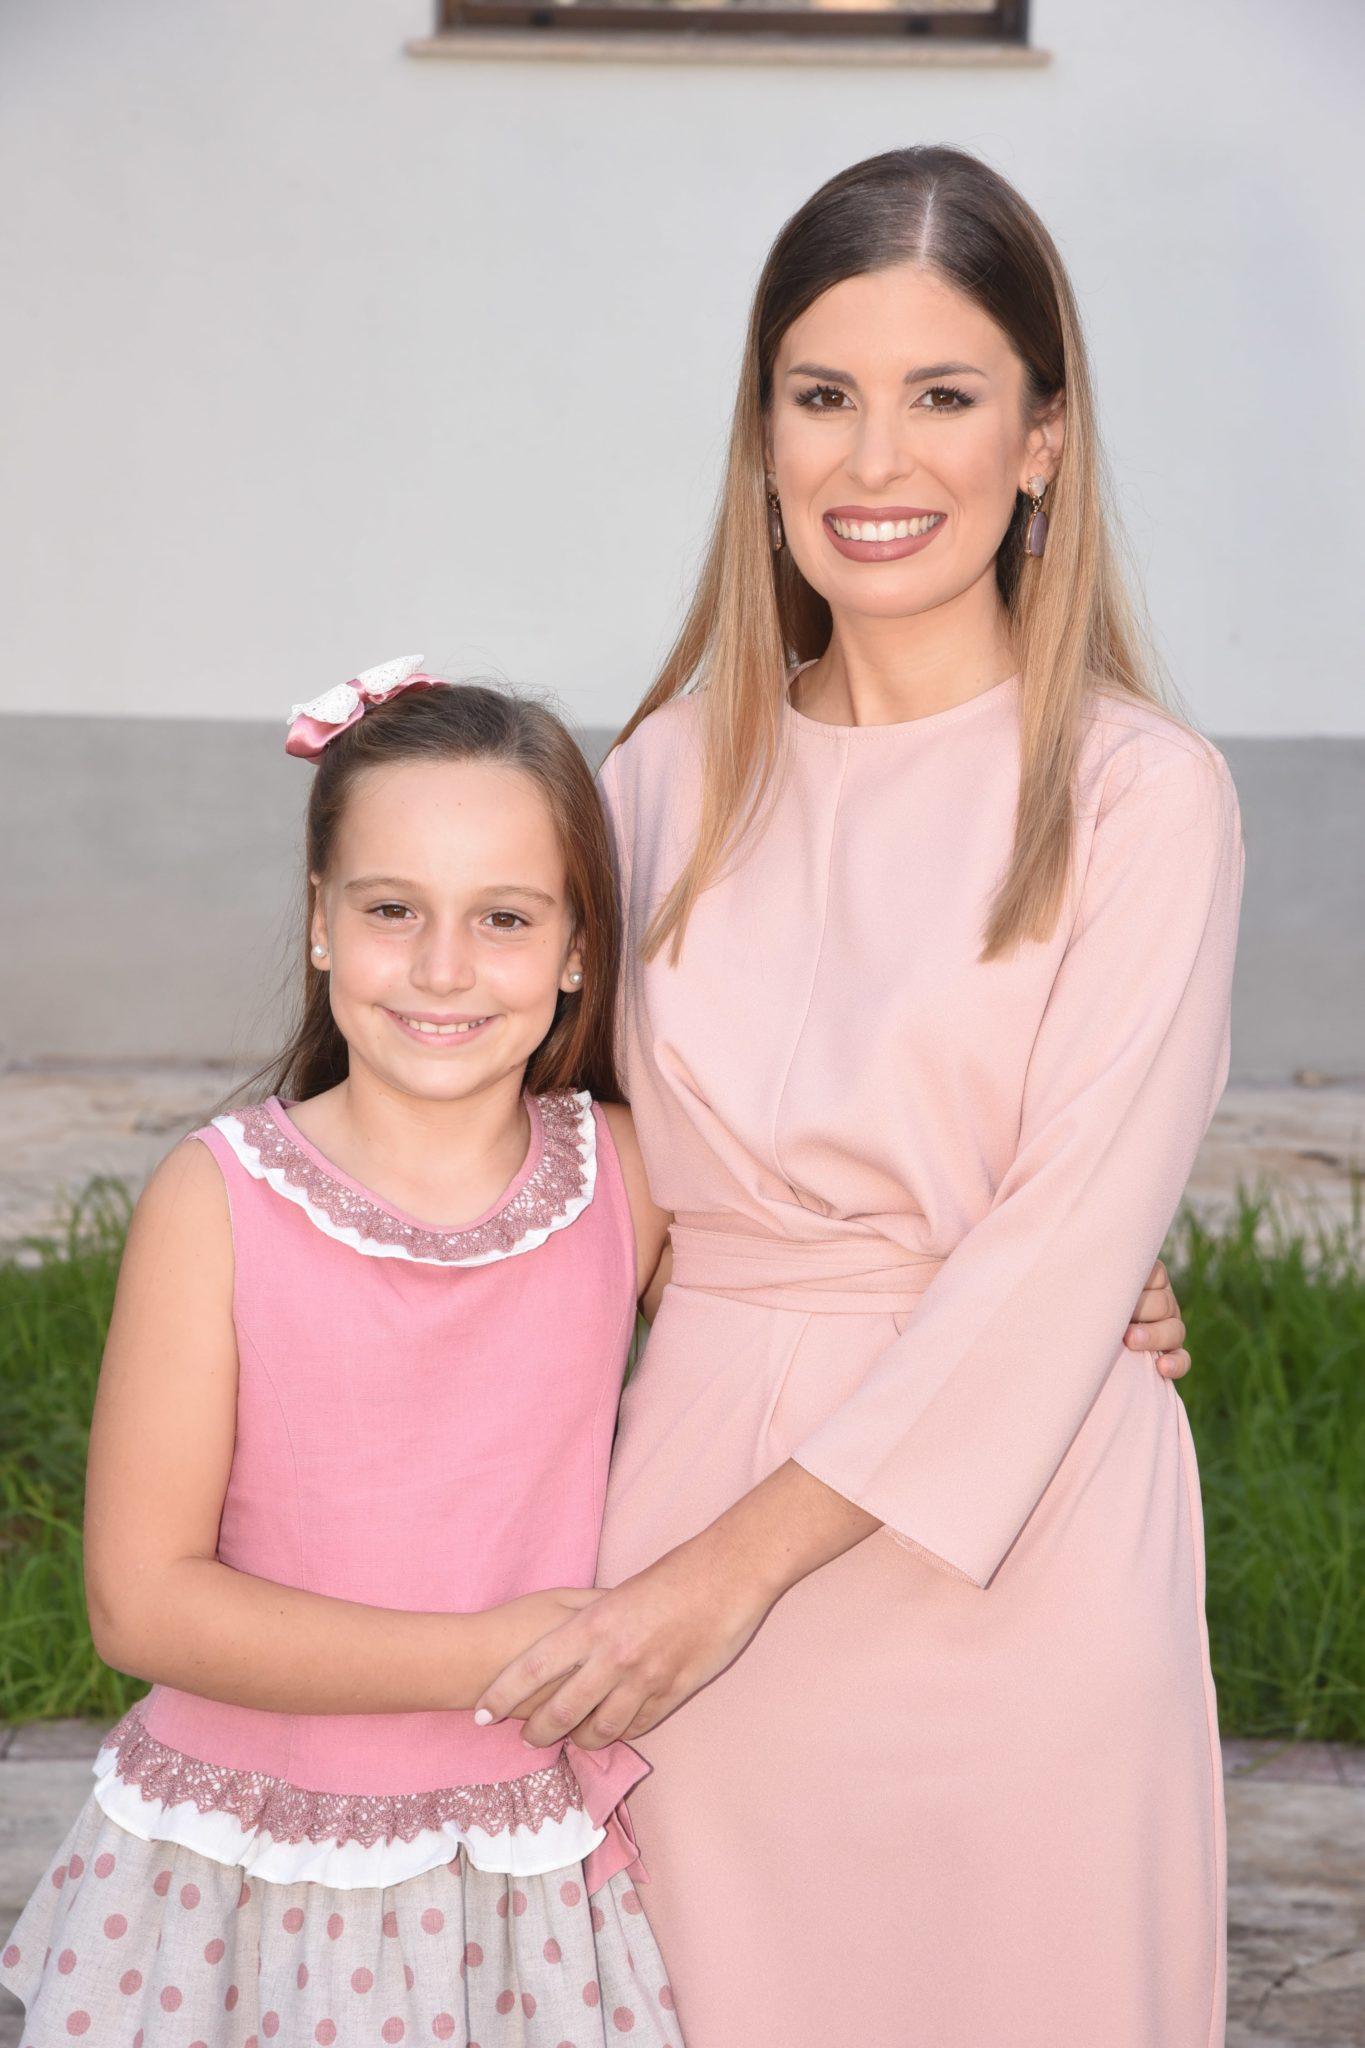 Marina Ballester y Carmen Giménez